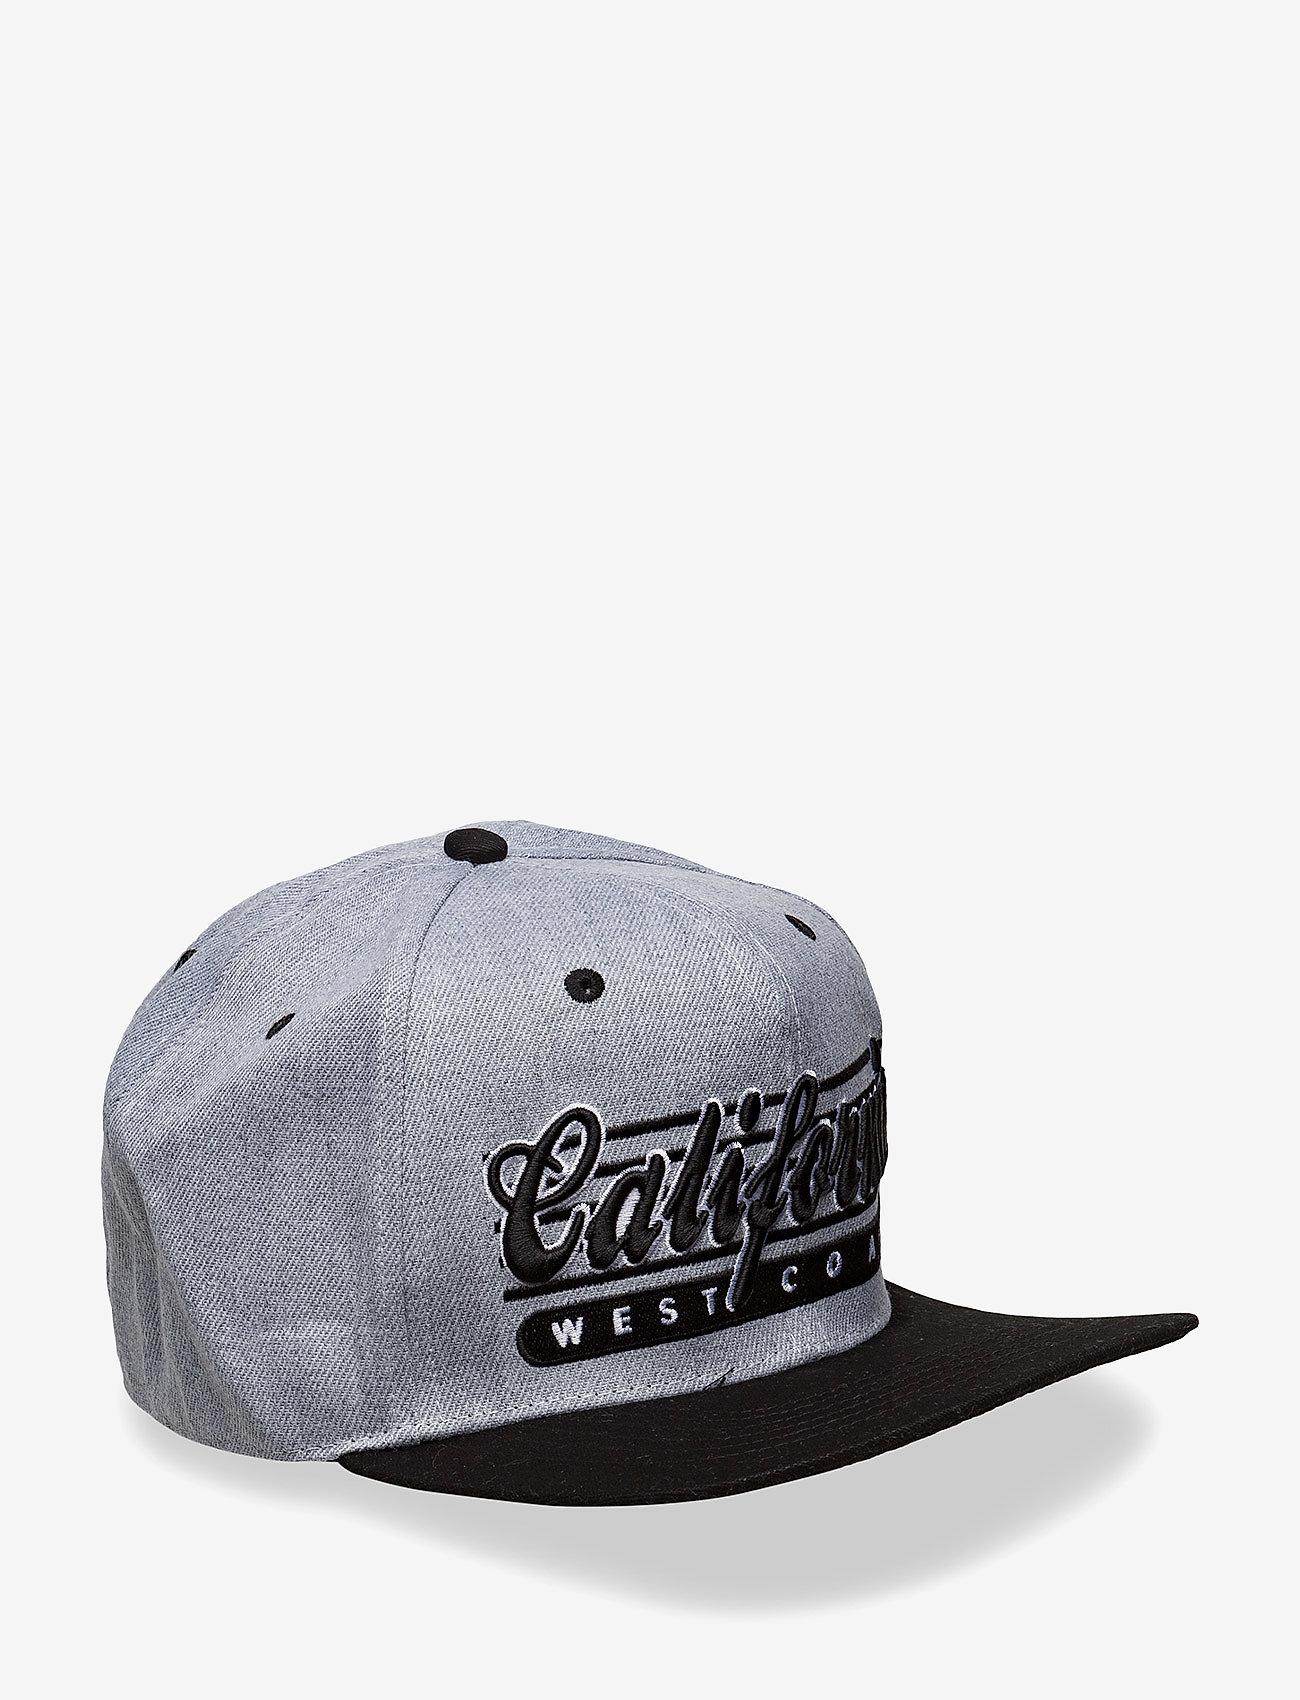 Blend Cap - Czapki i kapelusze STONE MIX - Akcesoria